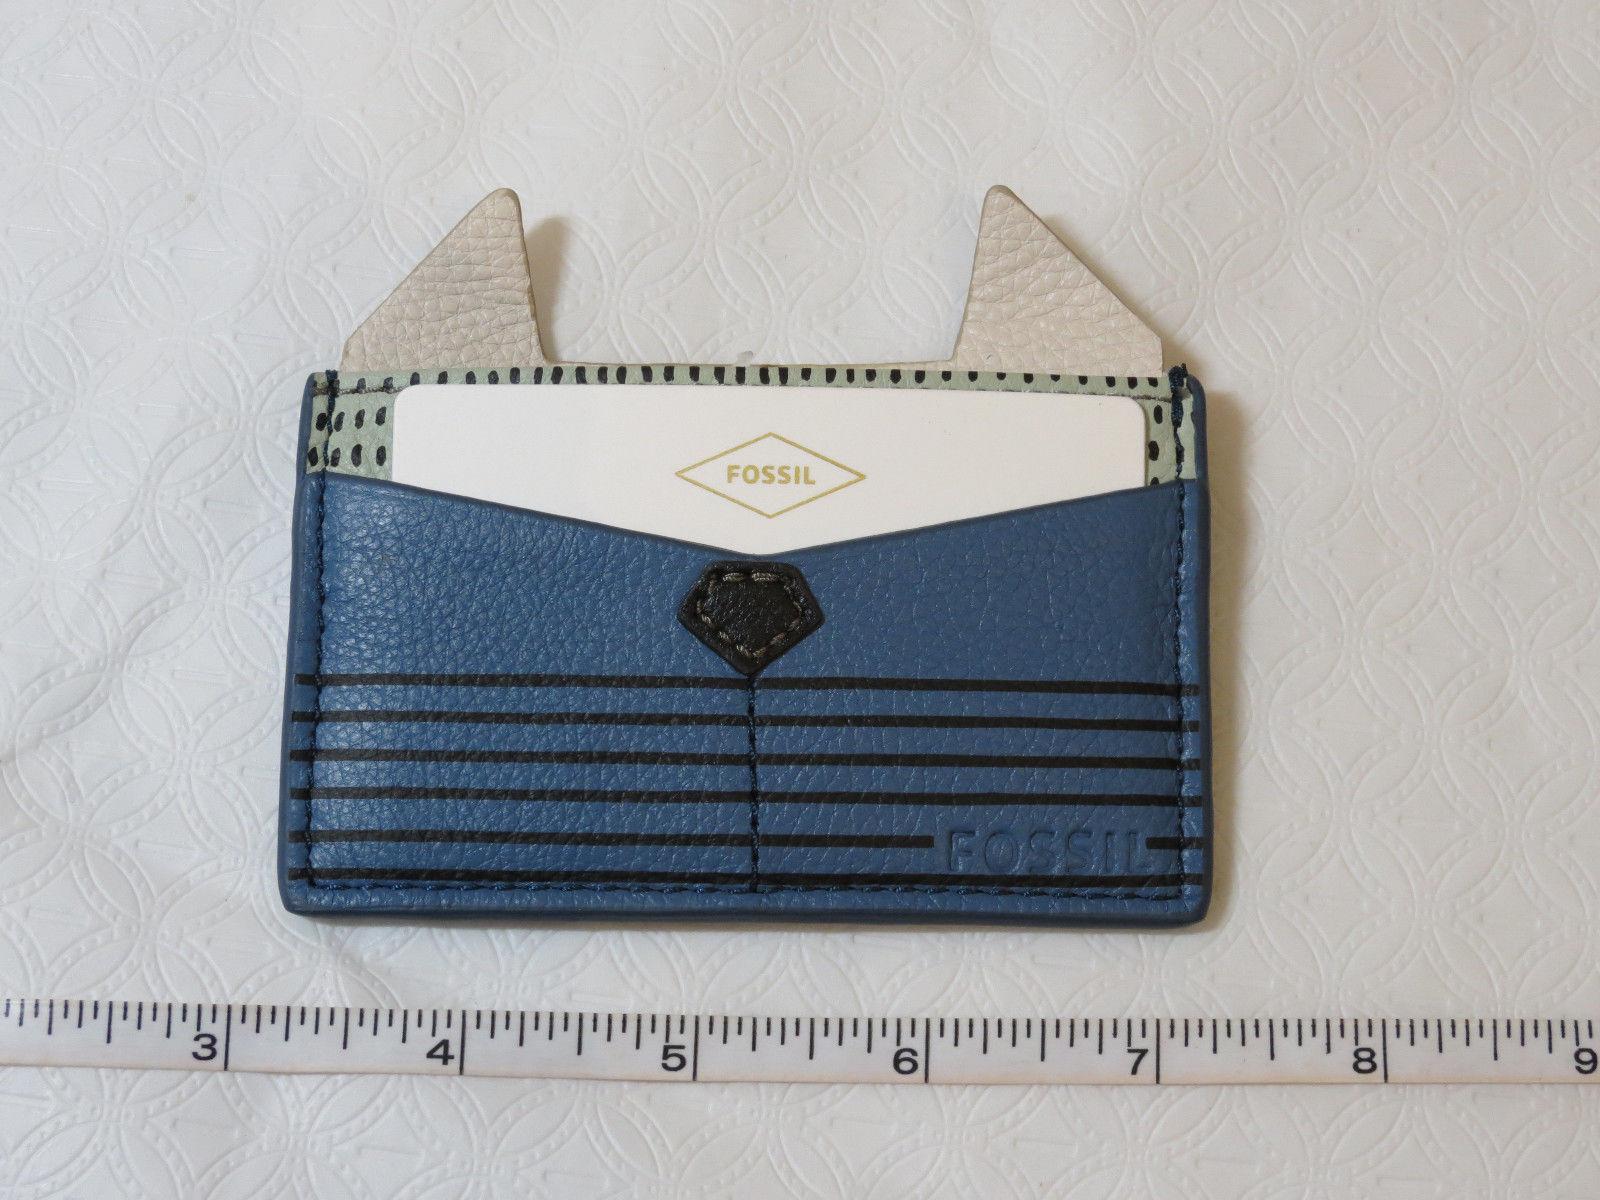 Fossil SL7424484 Card Case PL Cornflower Leather mini ID holder blue green NWT*^